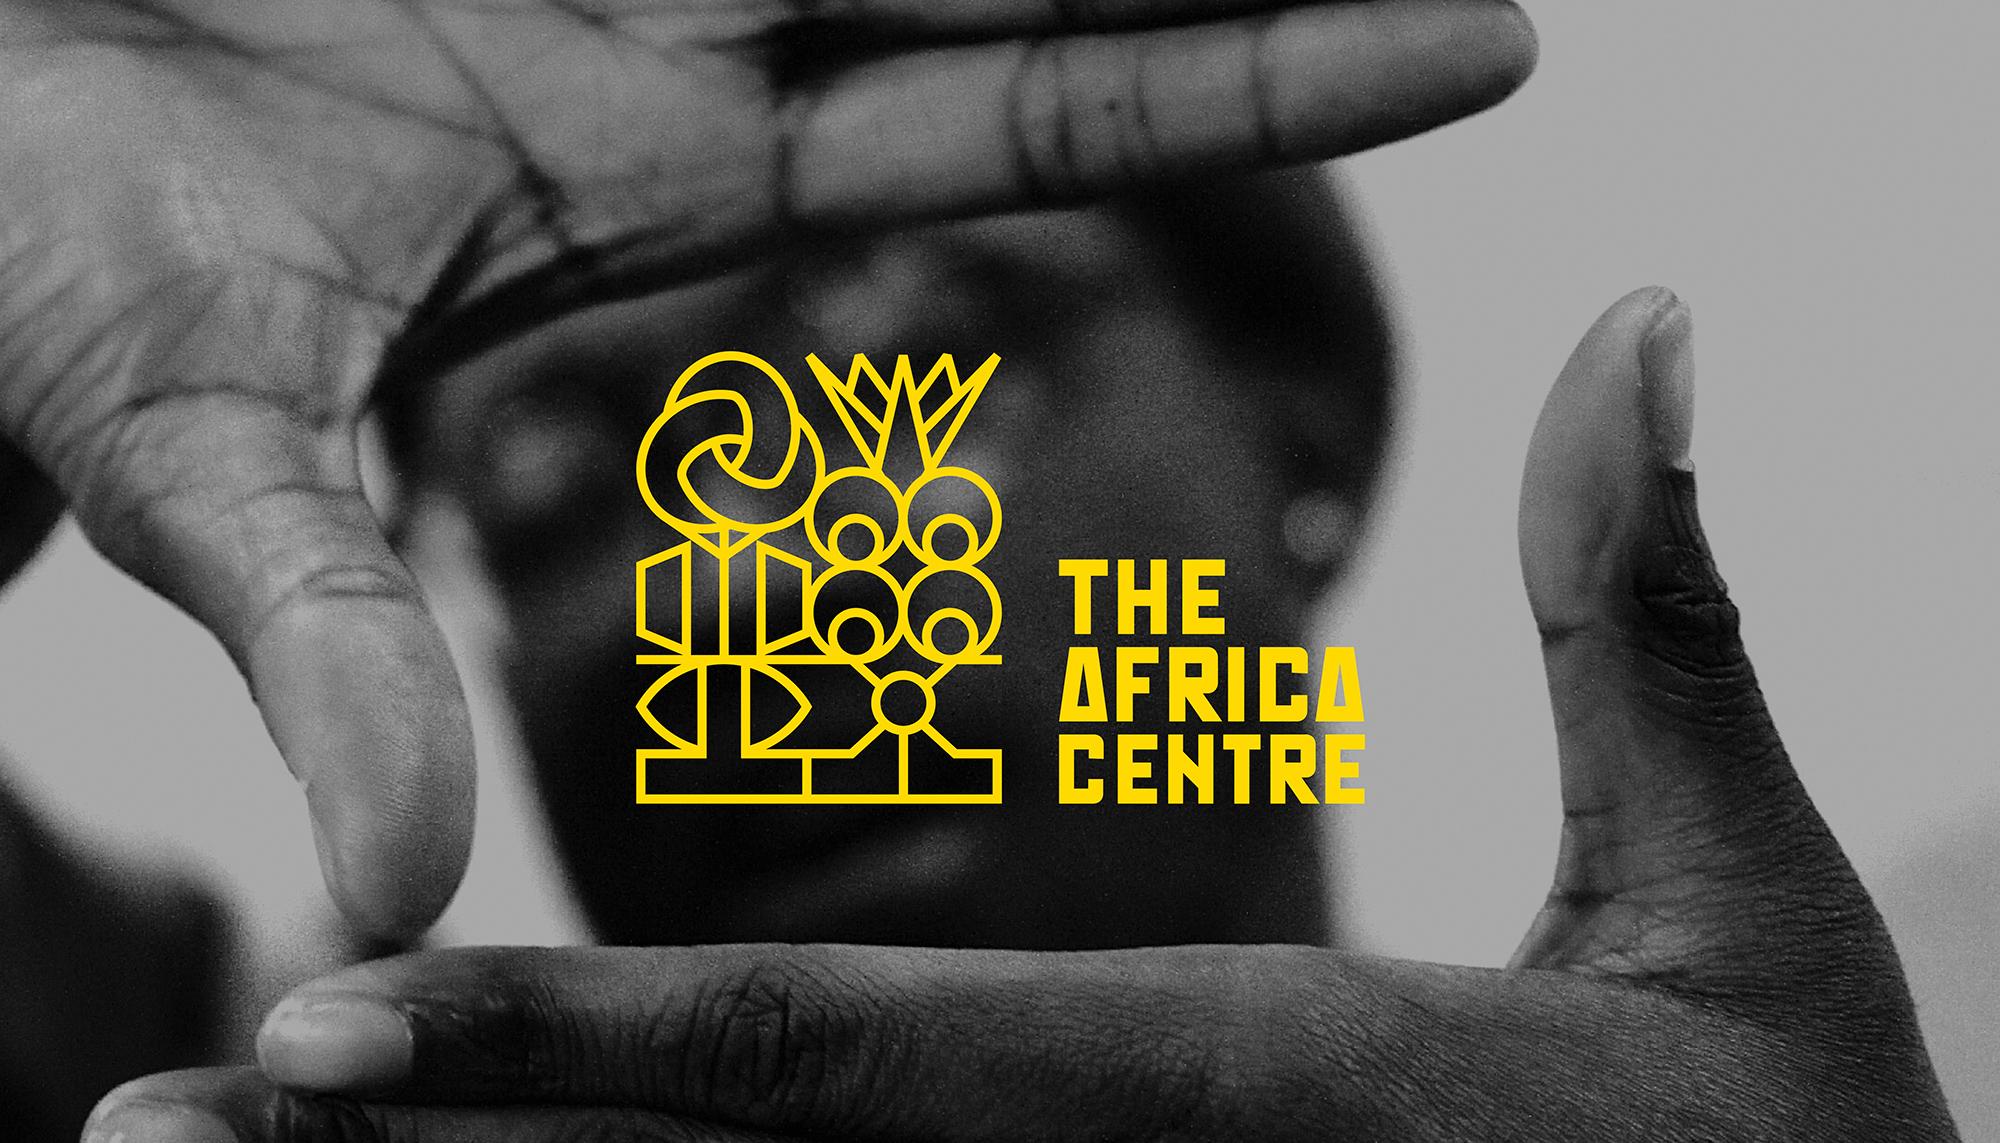 The Africa Centre Rebranding Designed by Mam'gobozi Design Factory